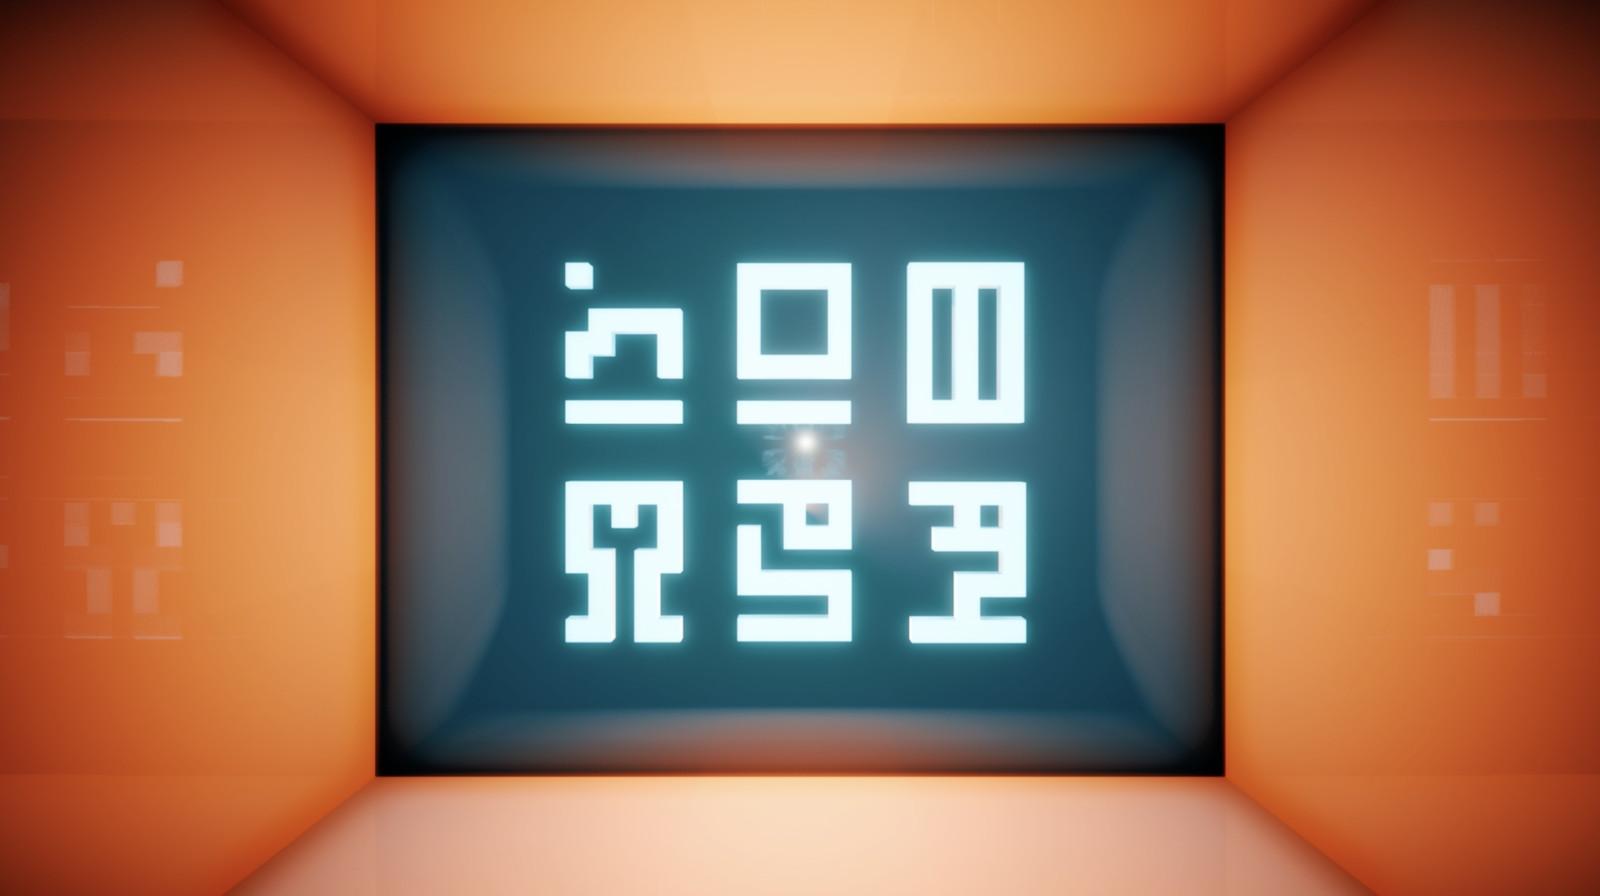 Abstract - Symbols